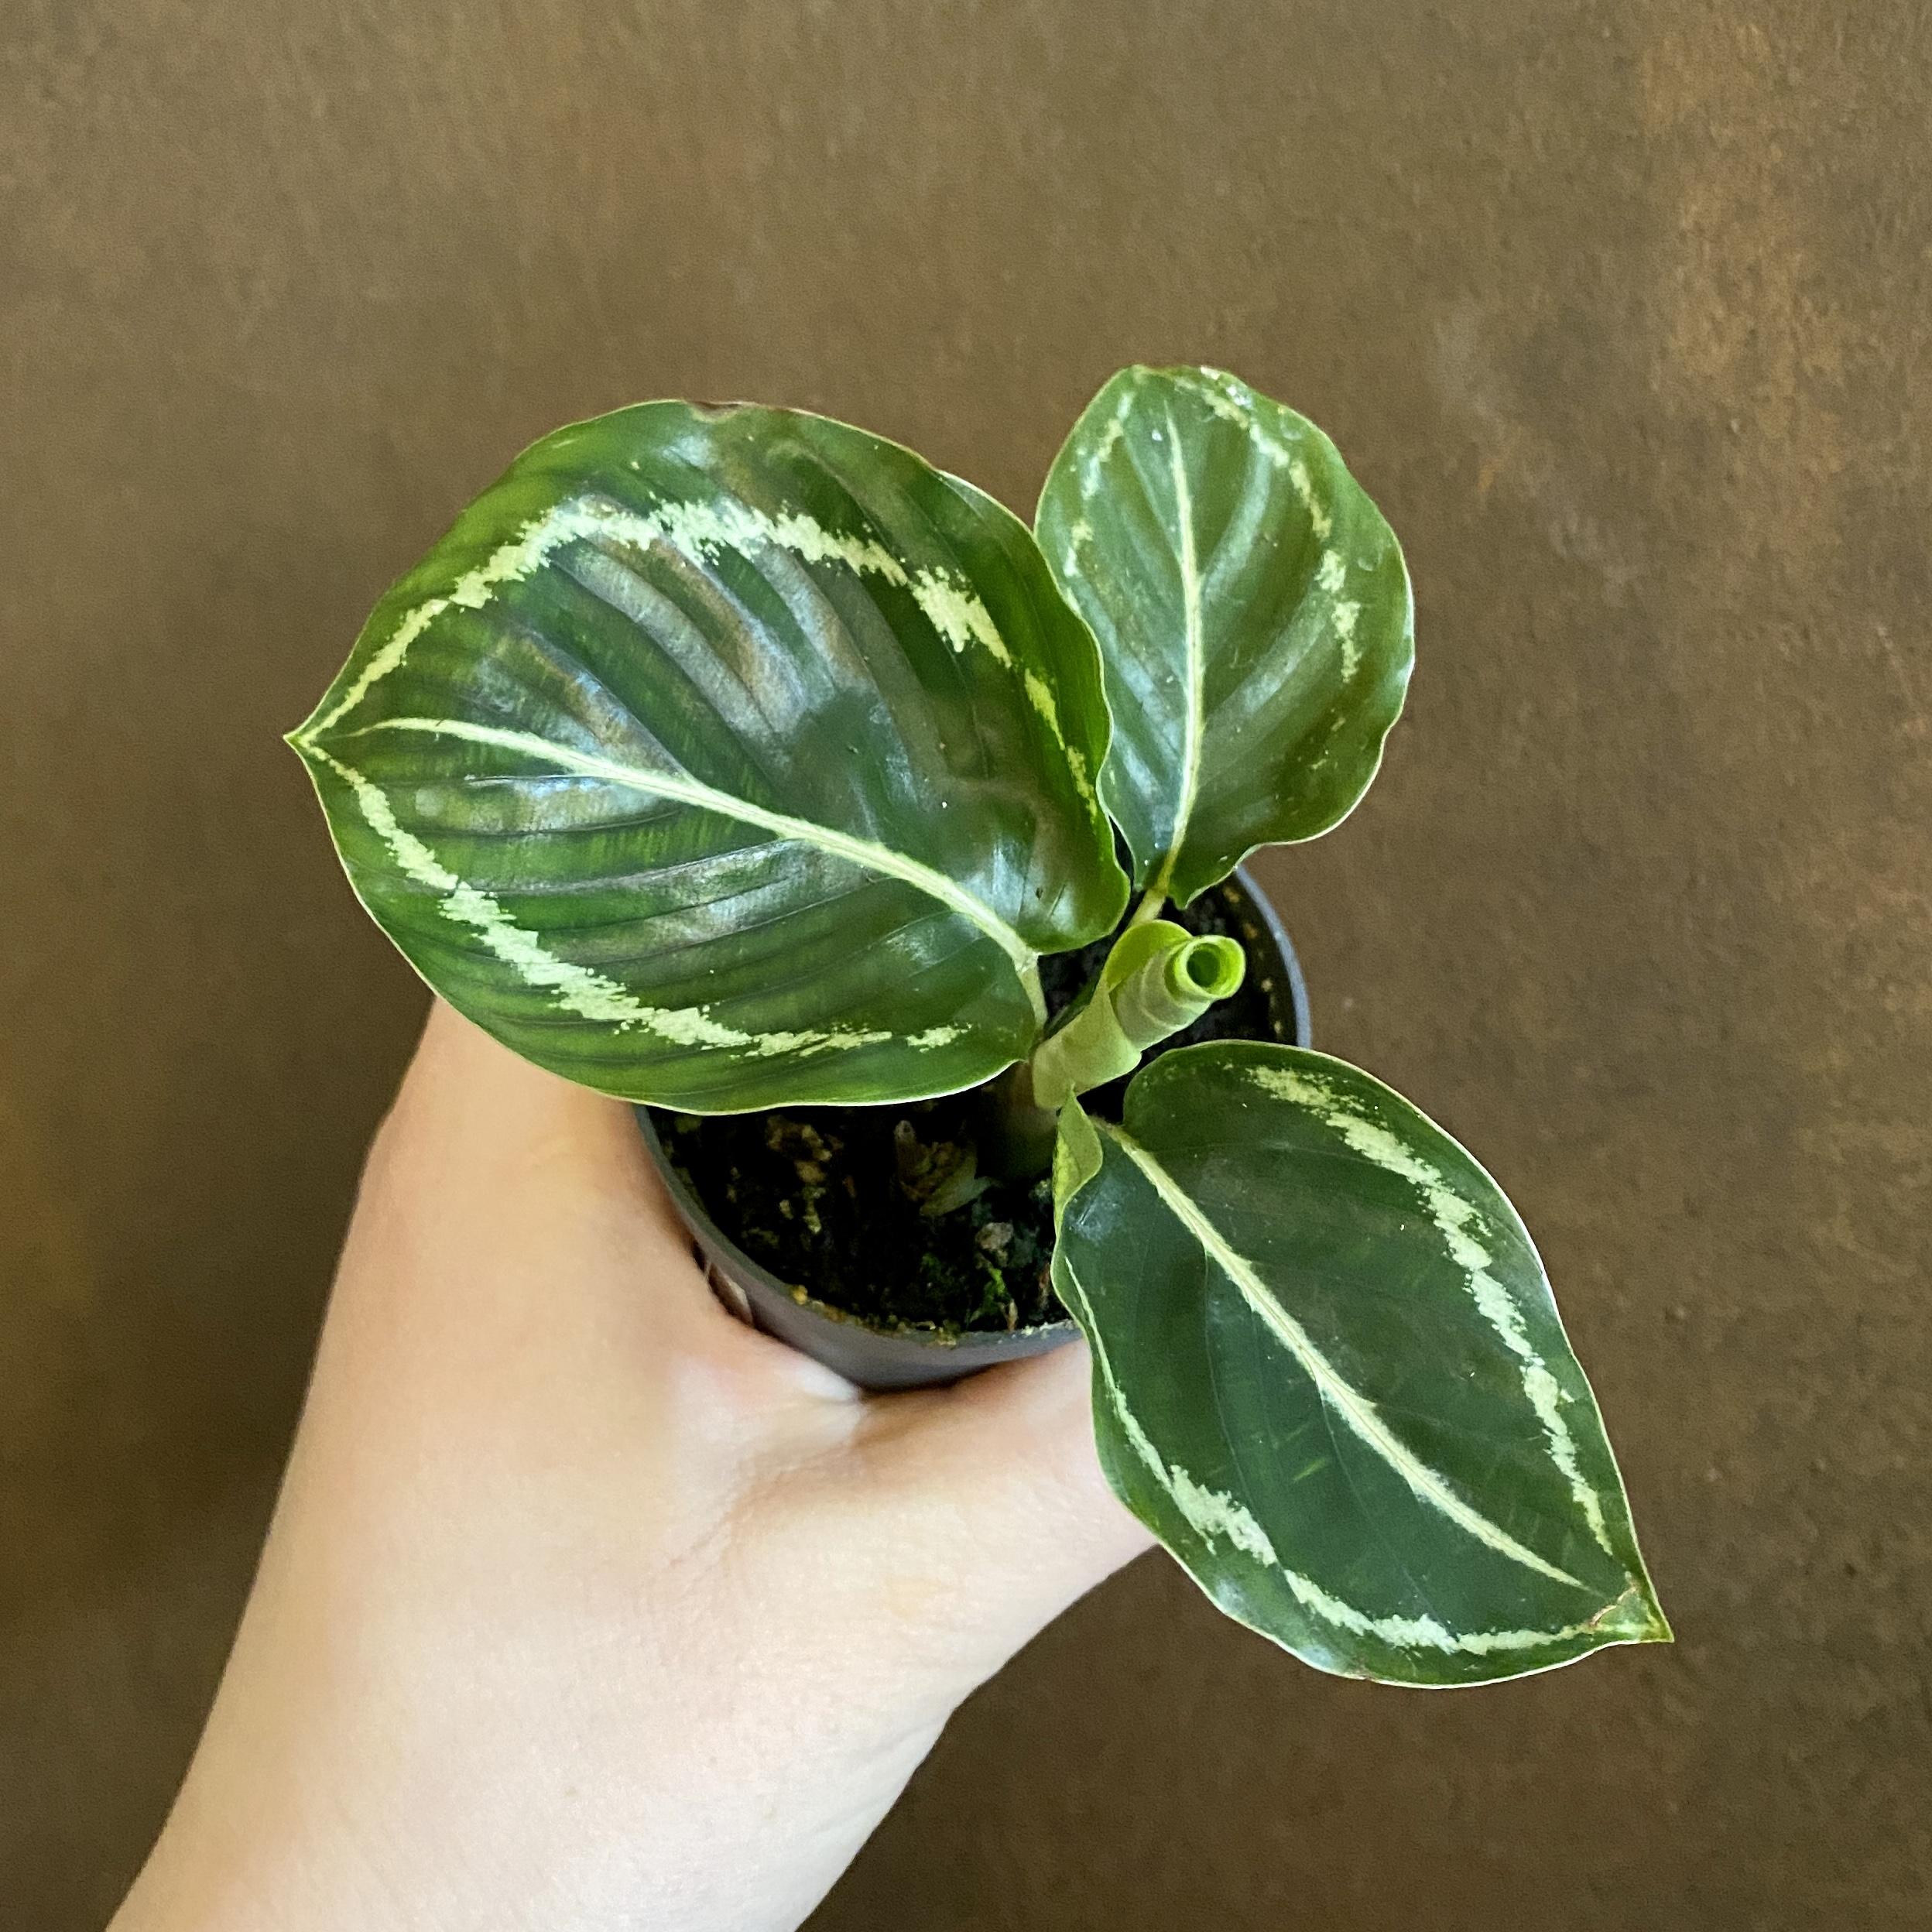 Calathea roseopicta 'Green'